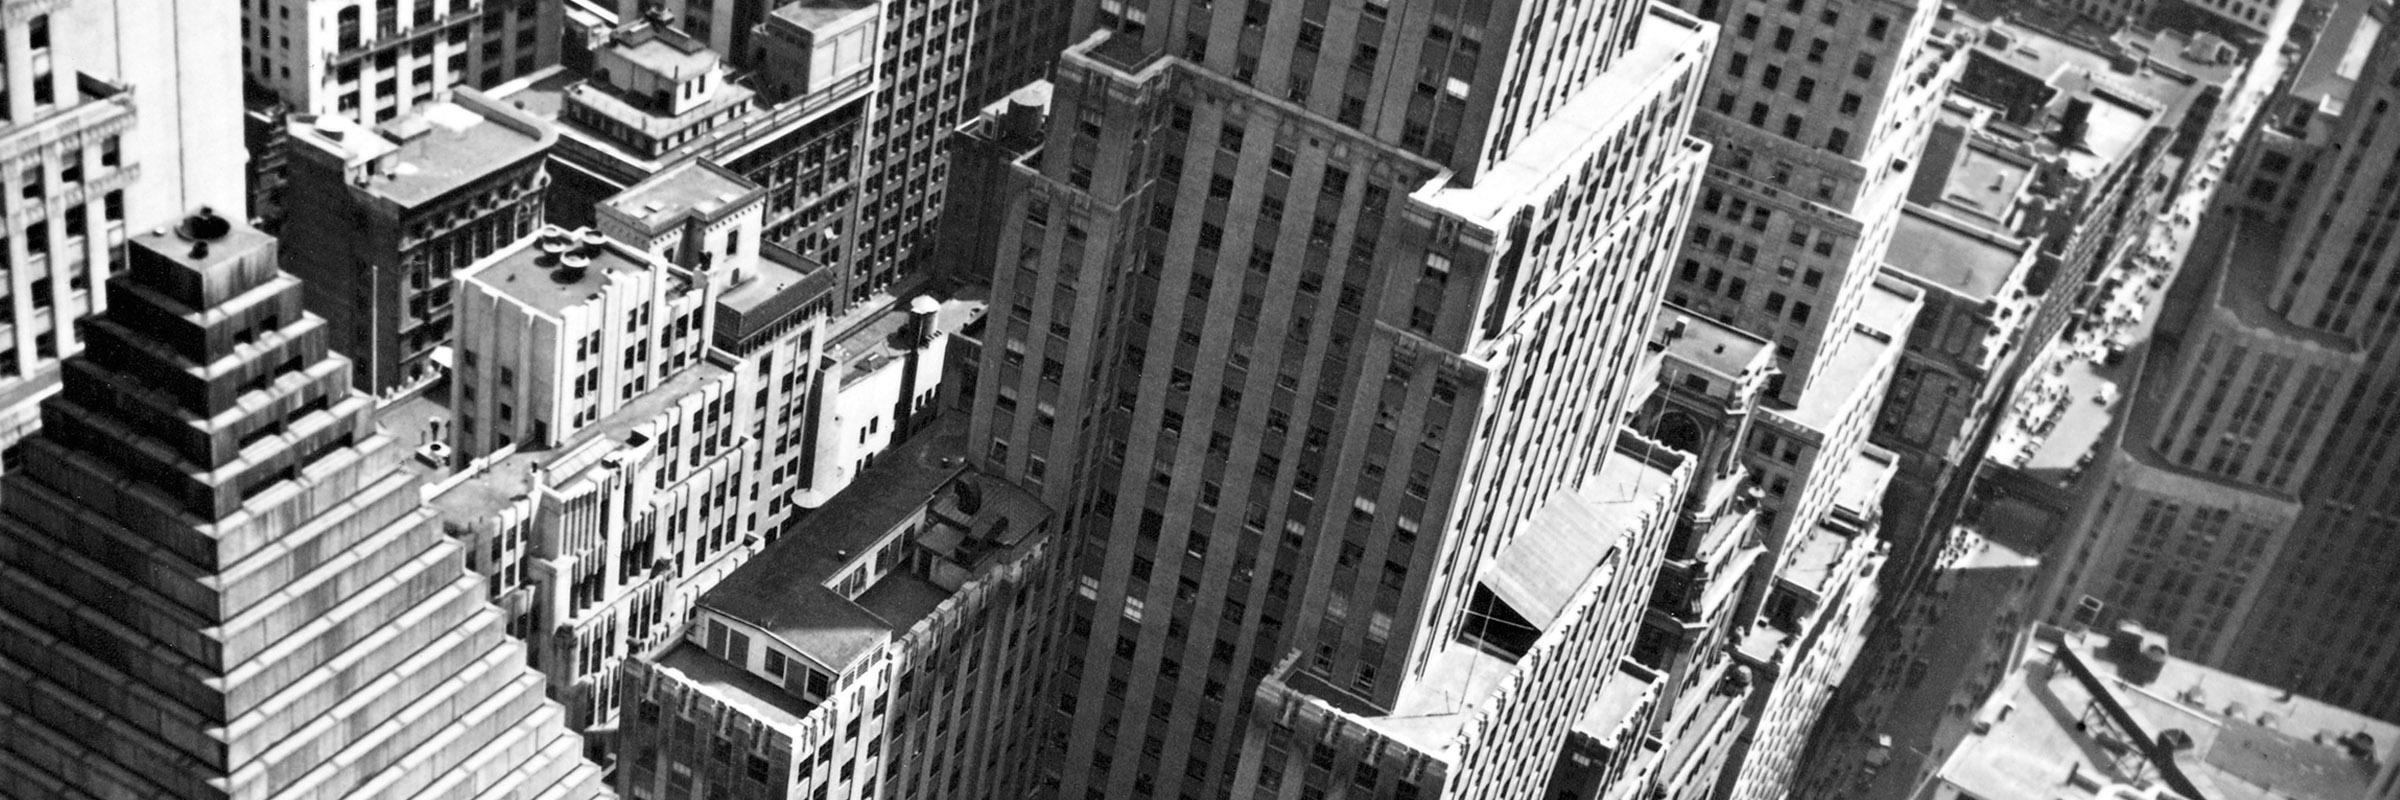 NYC_B.jpg